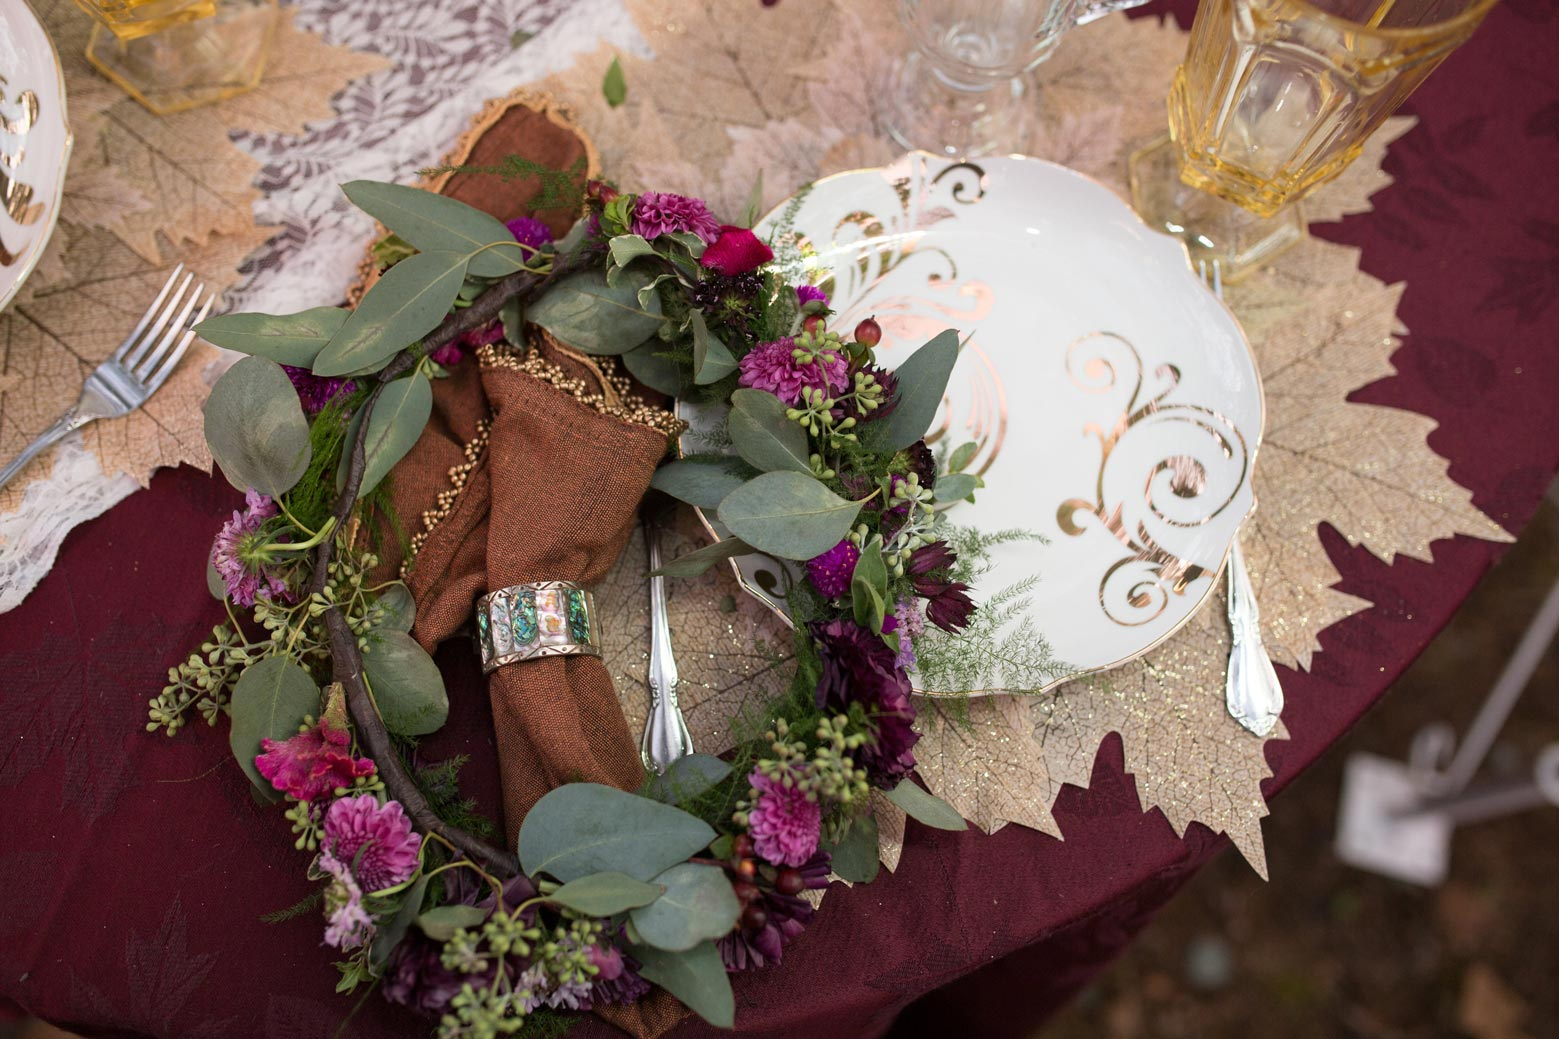 Rustic-Whimsical-Wedding- Tulsa-Wedding-FloristRobyns-Flower-Garden_Mallory-Hall-Photography09.jpg